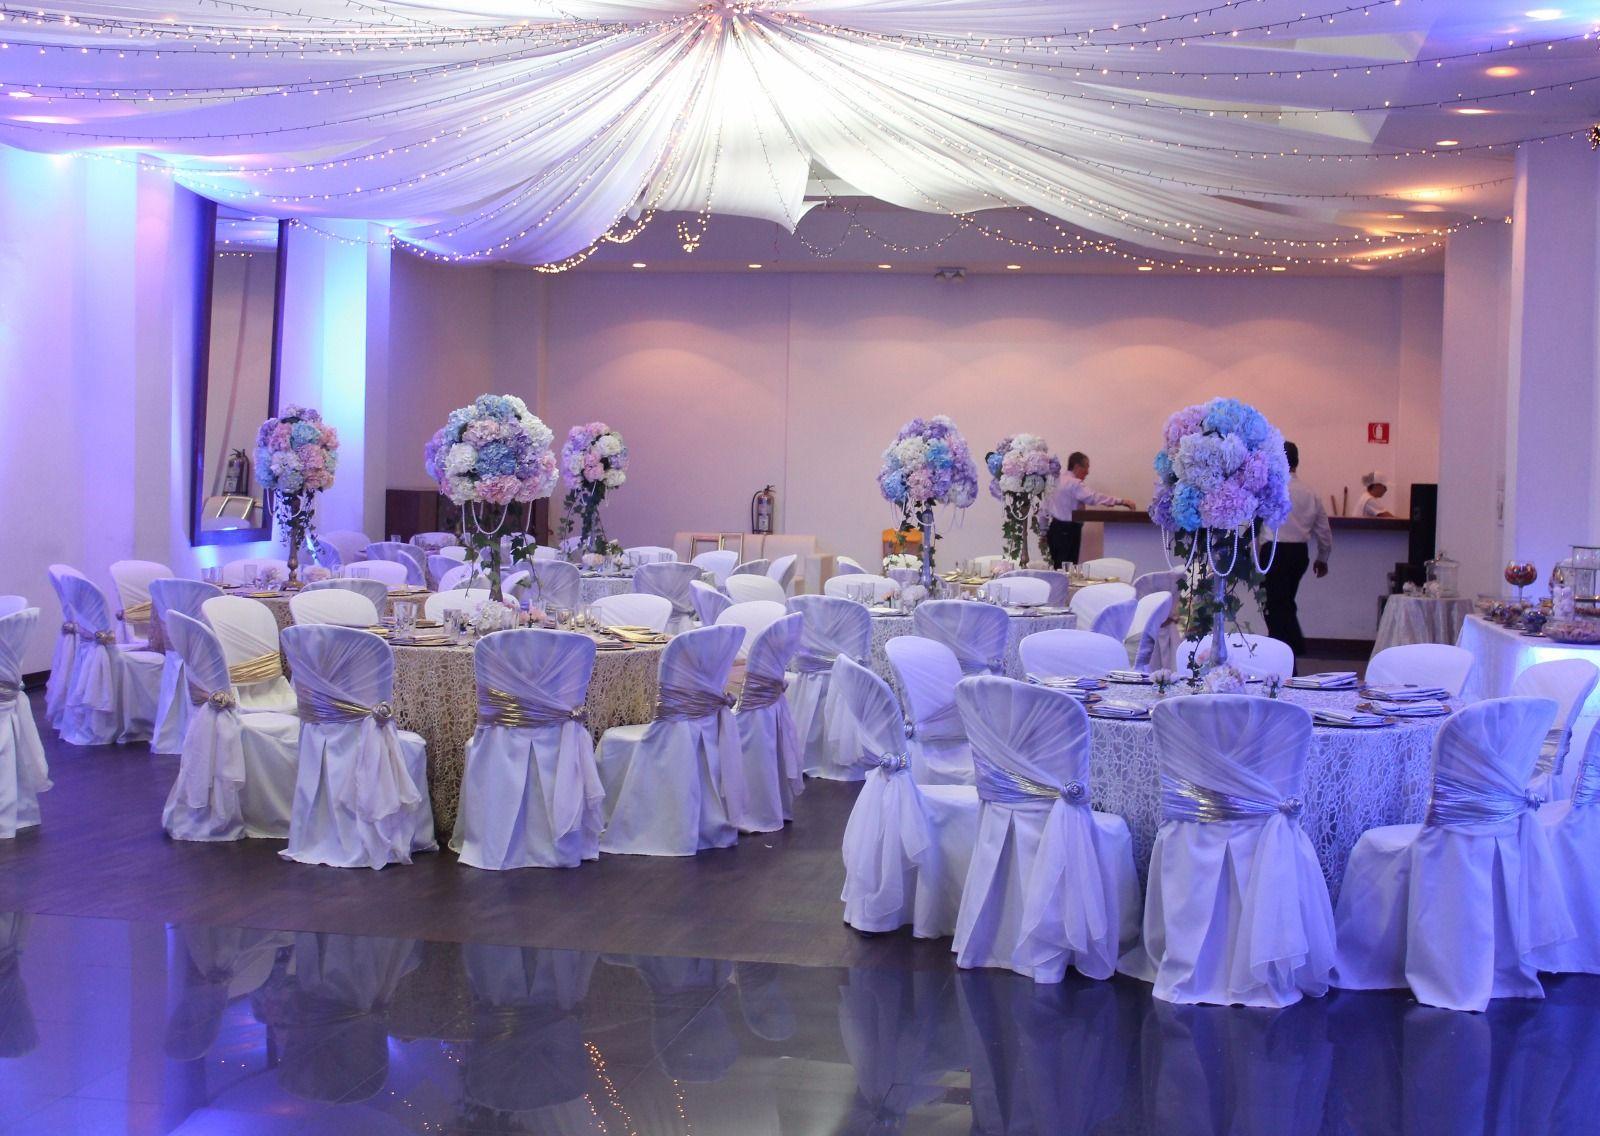 M s informaci n sobre eventos matrimonios bodas 15 a os - Decoracion de salones de casa ...